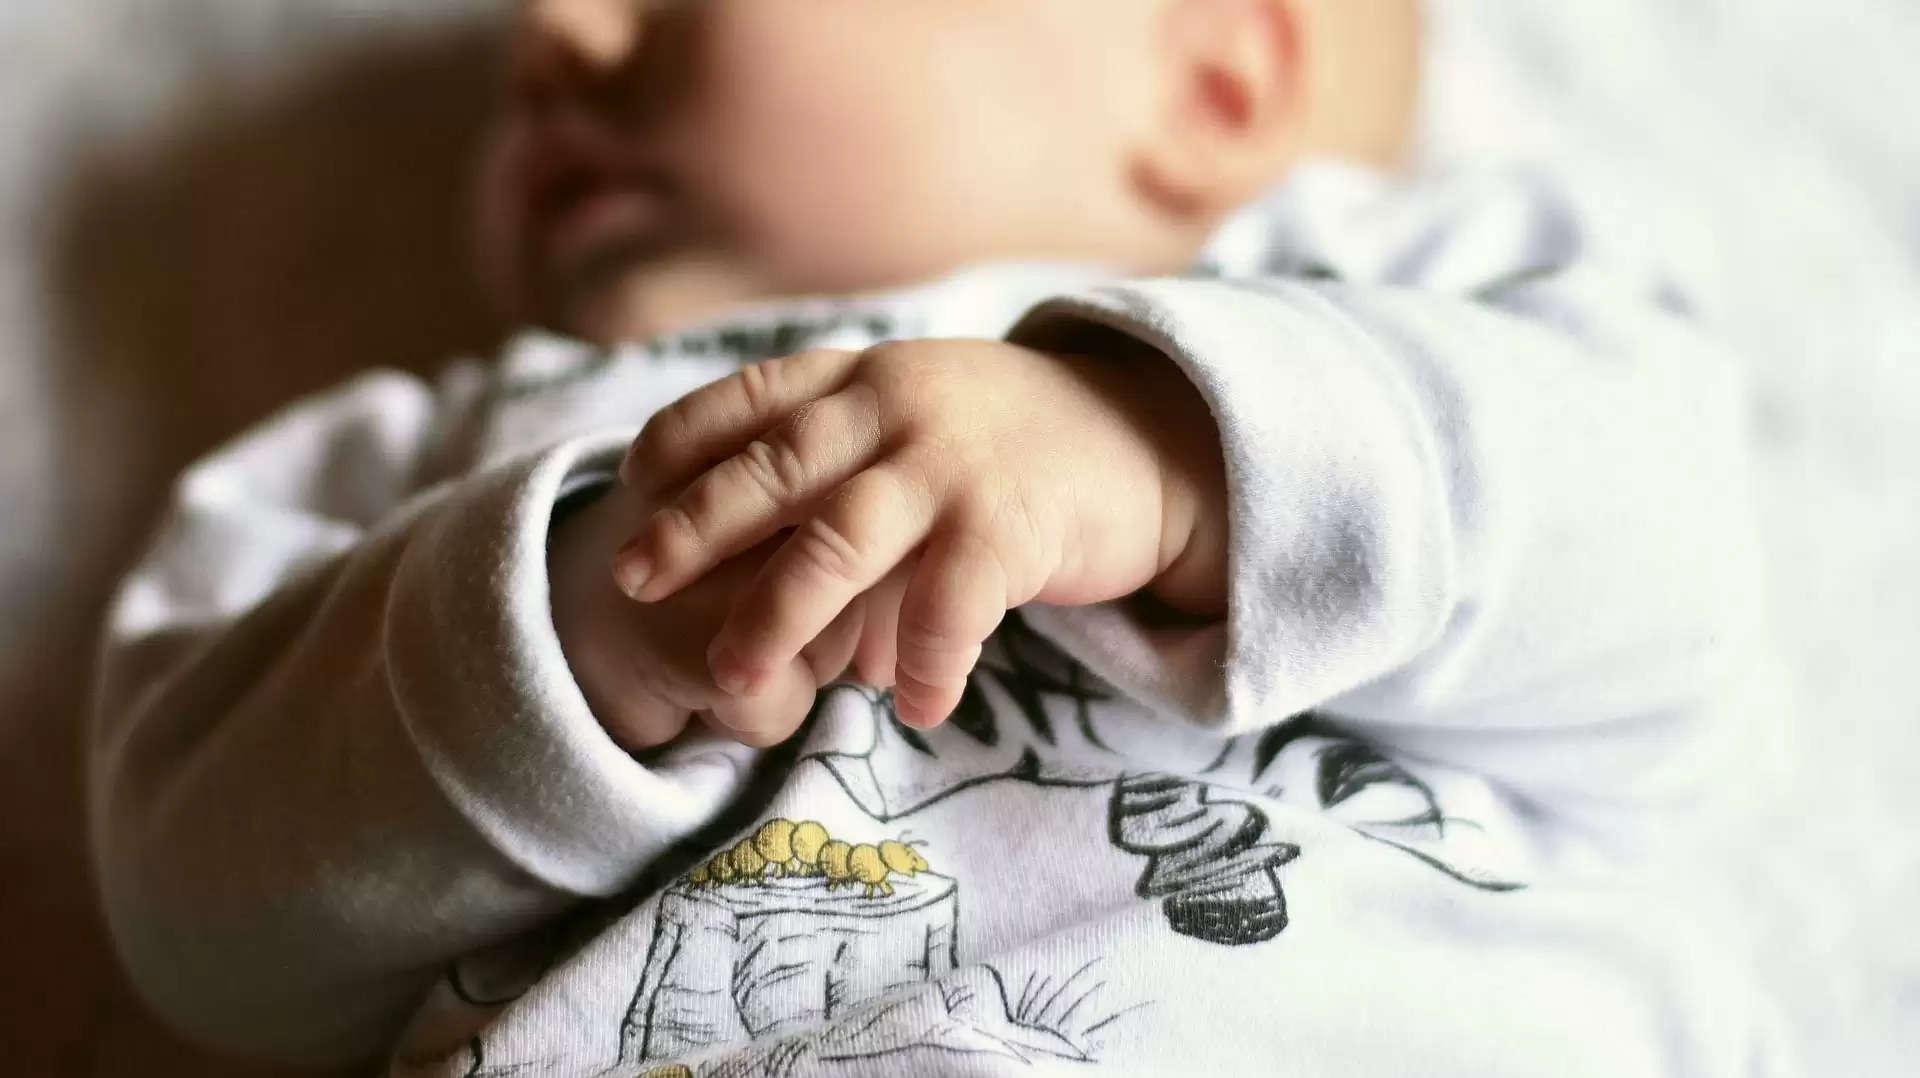 China witnesses decline in registered newborn babies